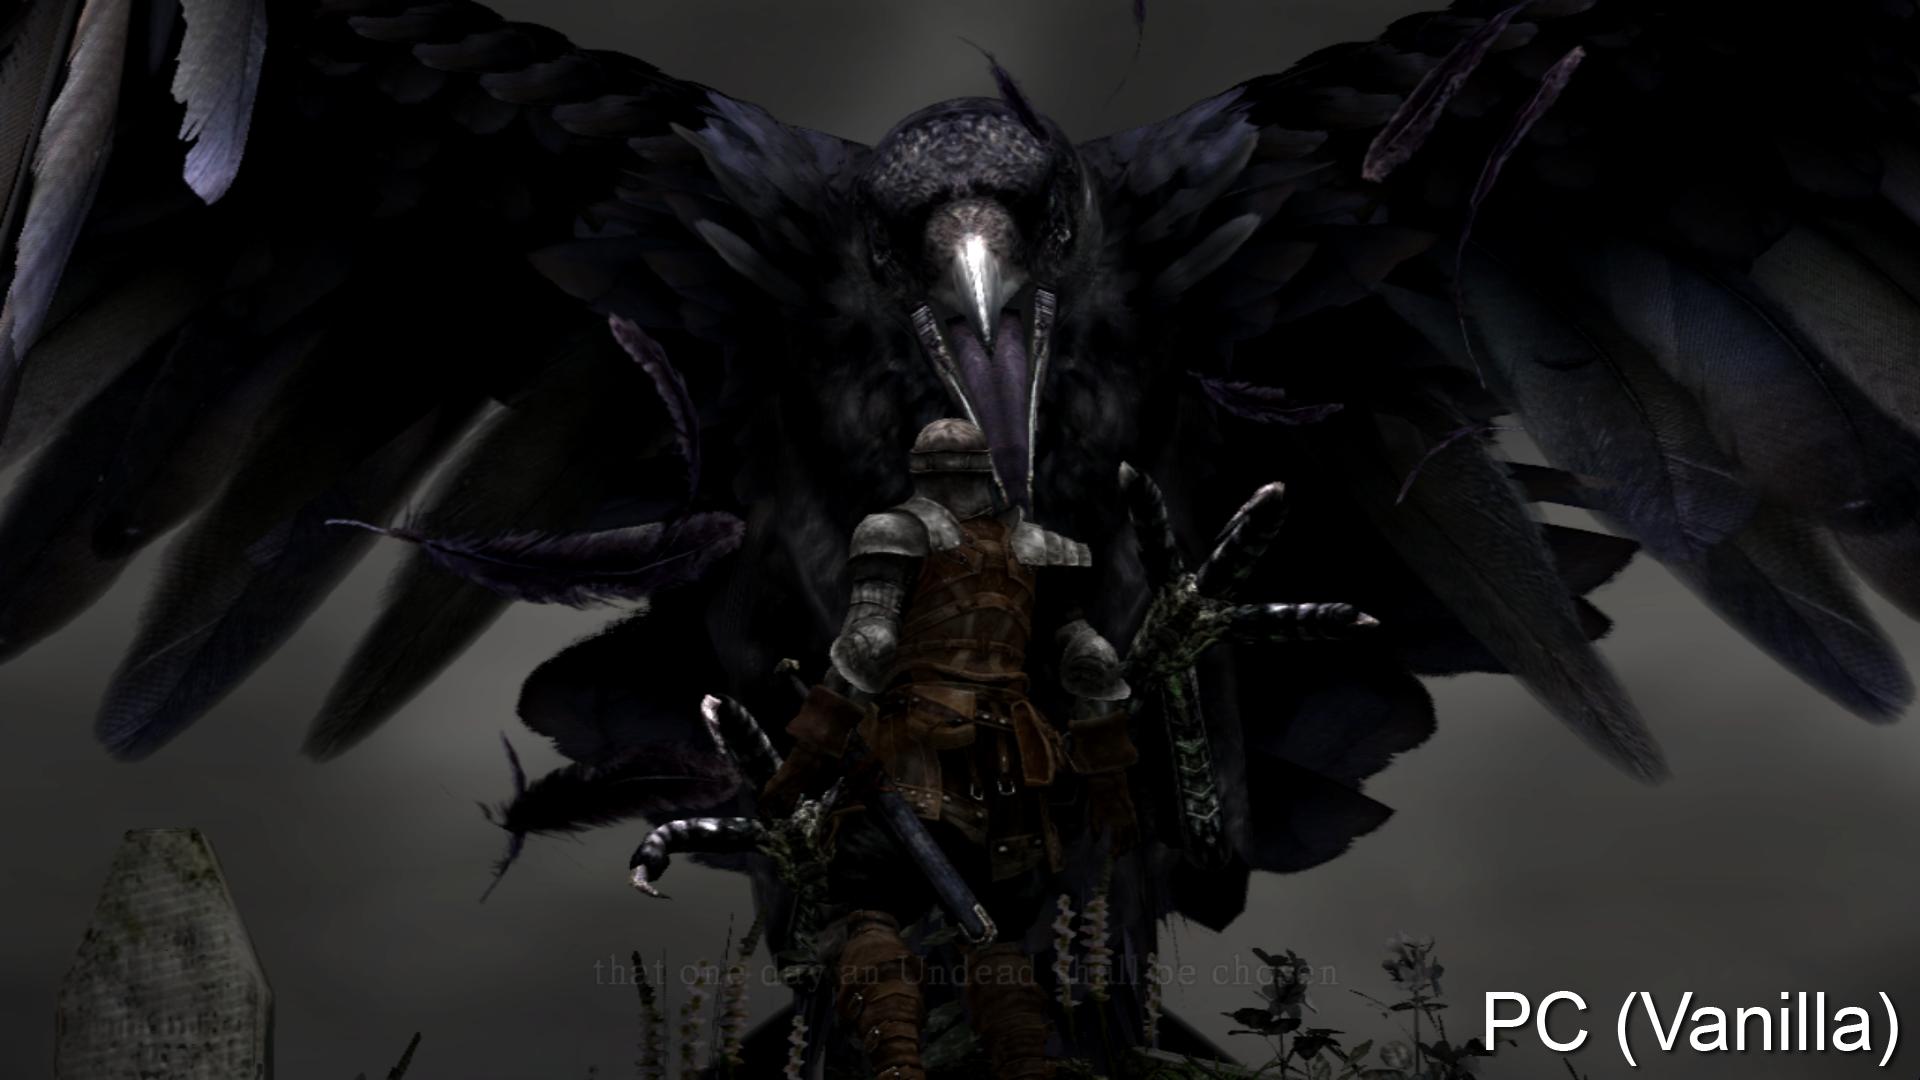 Dark Souls 2 Wallpaper 1080p 1080p Shots of Dark Souls 1920x1080